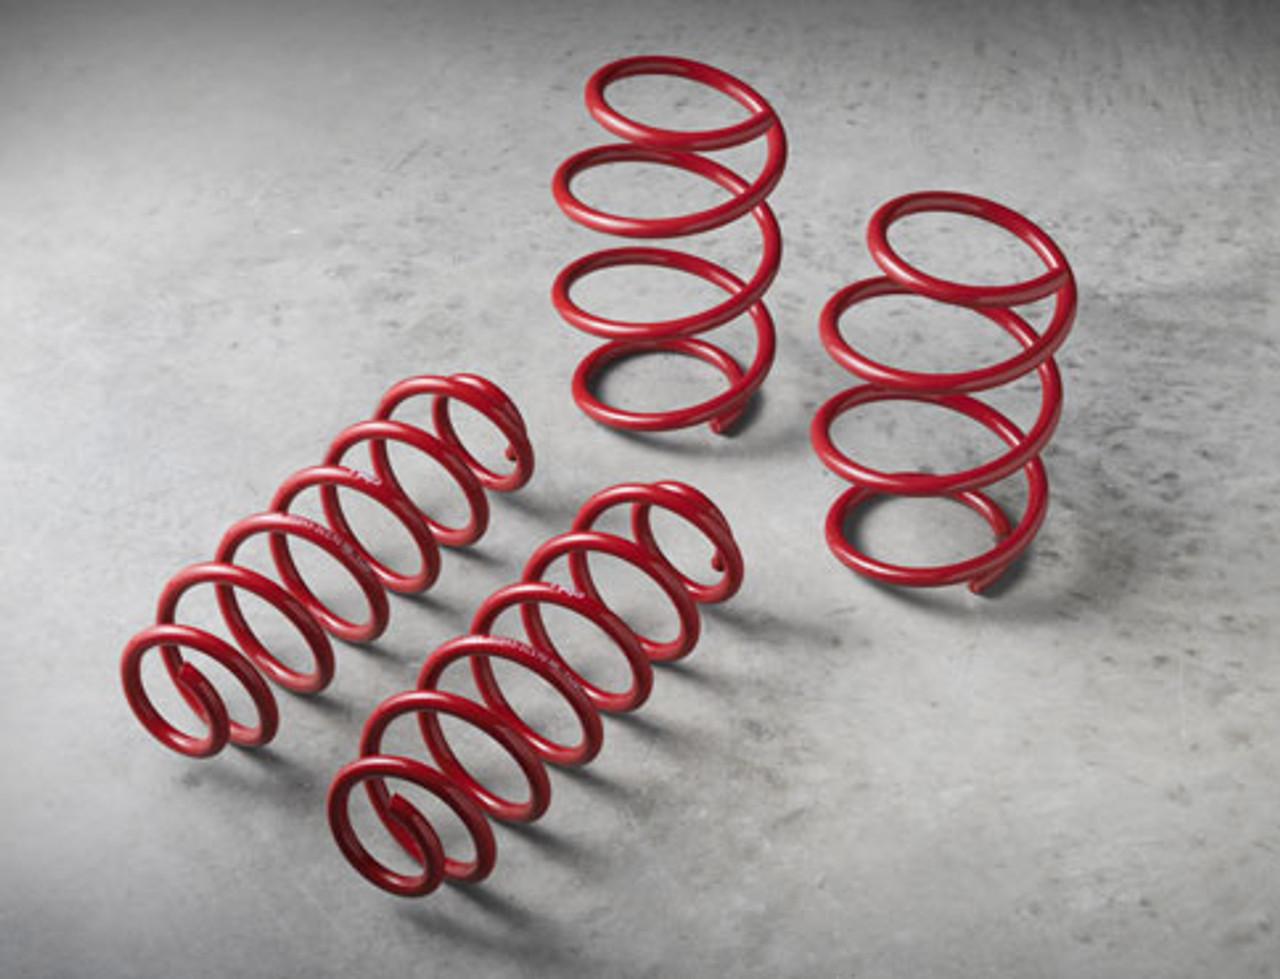 PT843-1C170 Chr TRD Lwrng Sprngs Genuine Toyota Parts